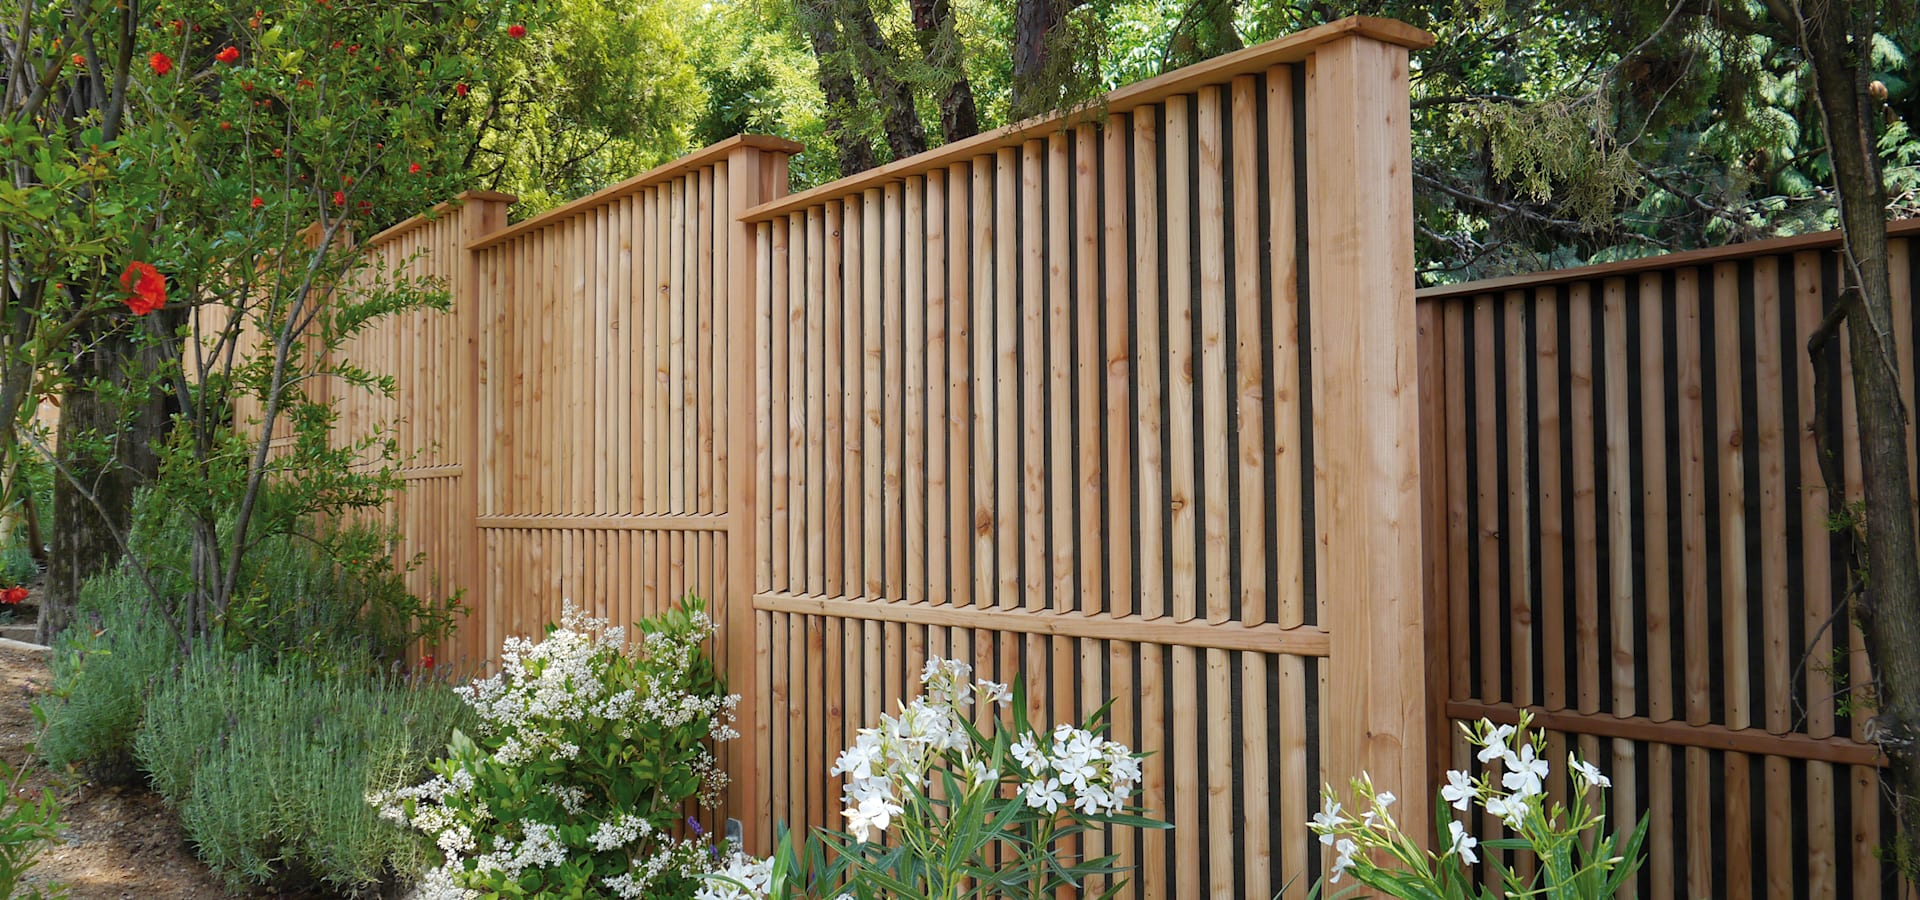 Braun & Würfele – Holz im Garten